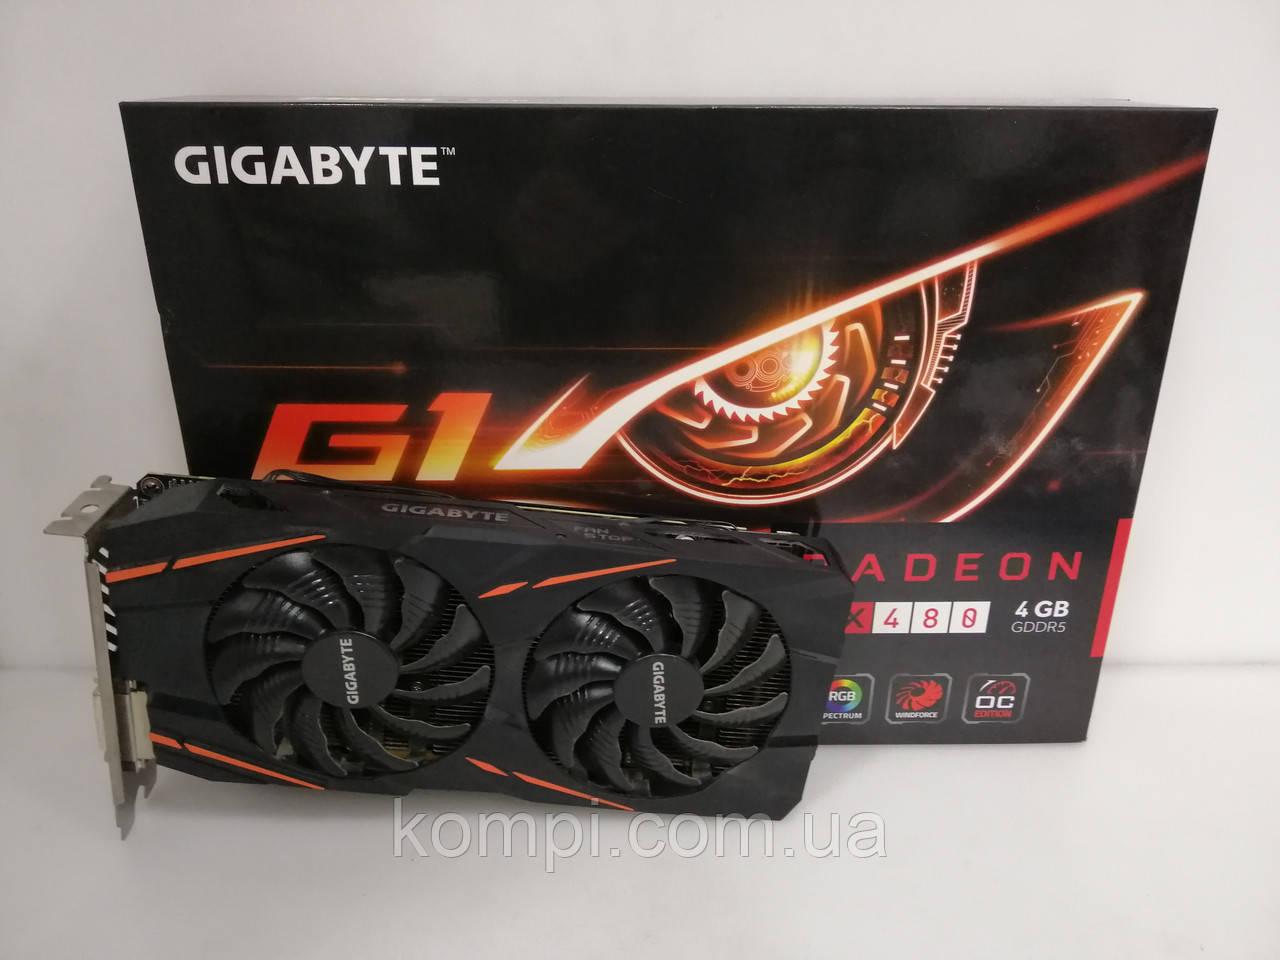 Видеокарта Gigabyte Gaming G1 RX480 4GB / Майнинг